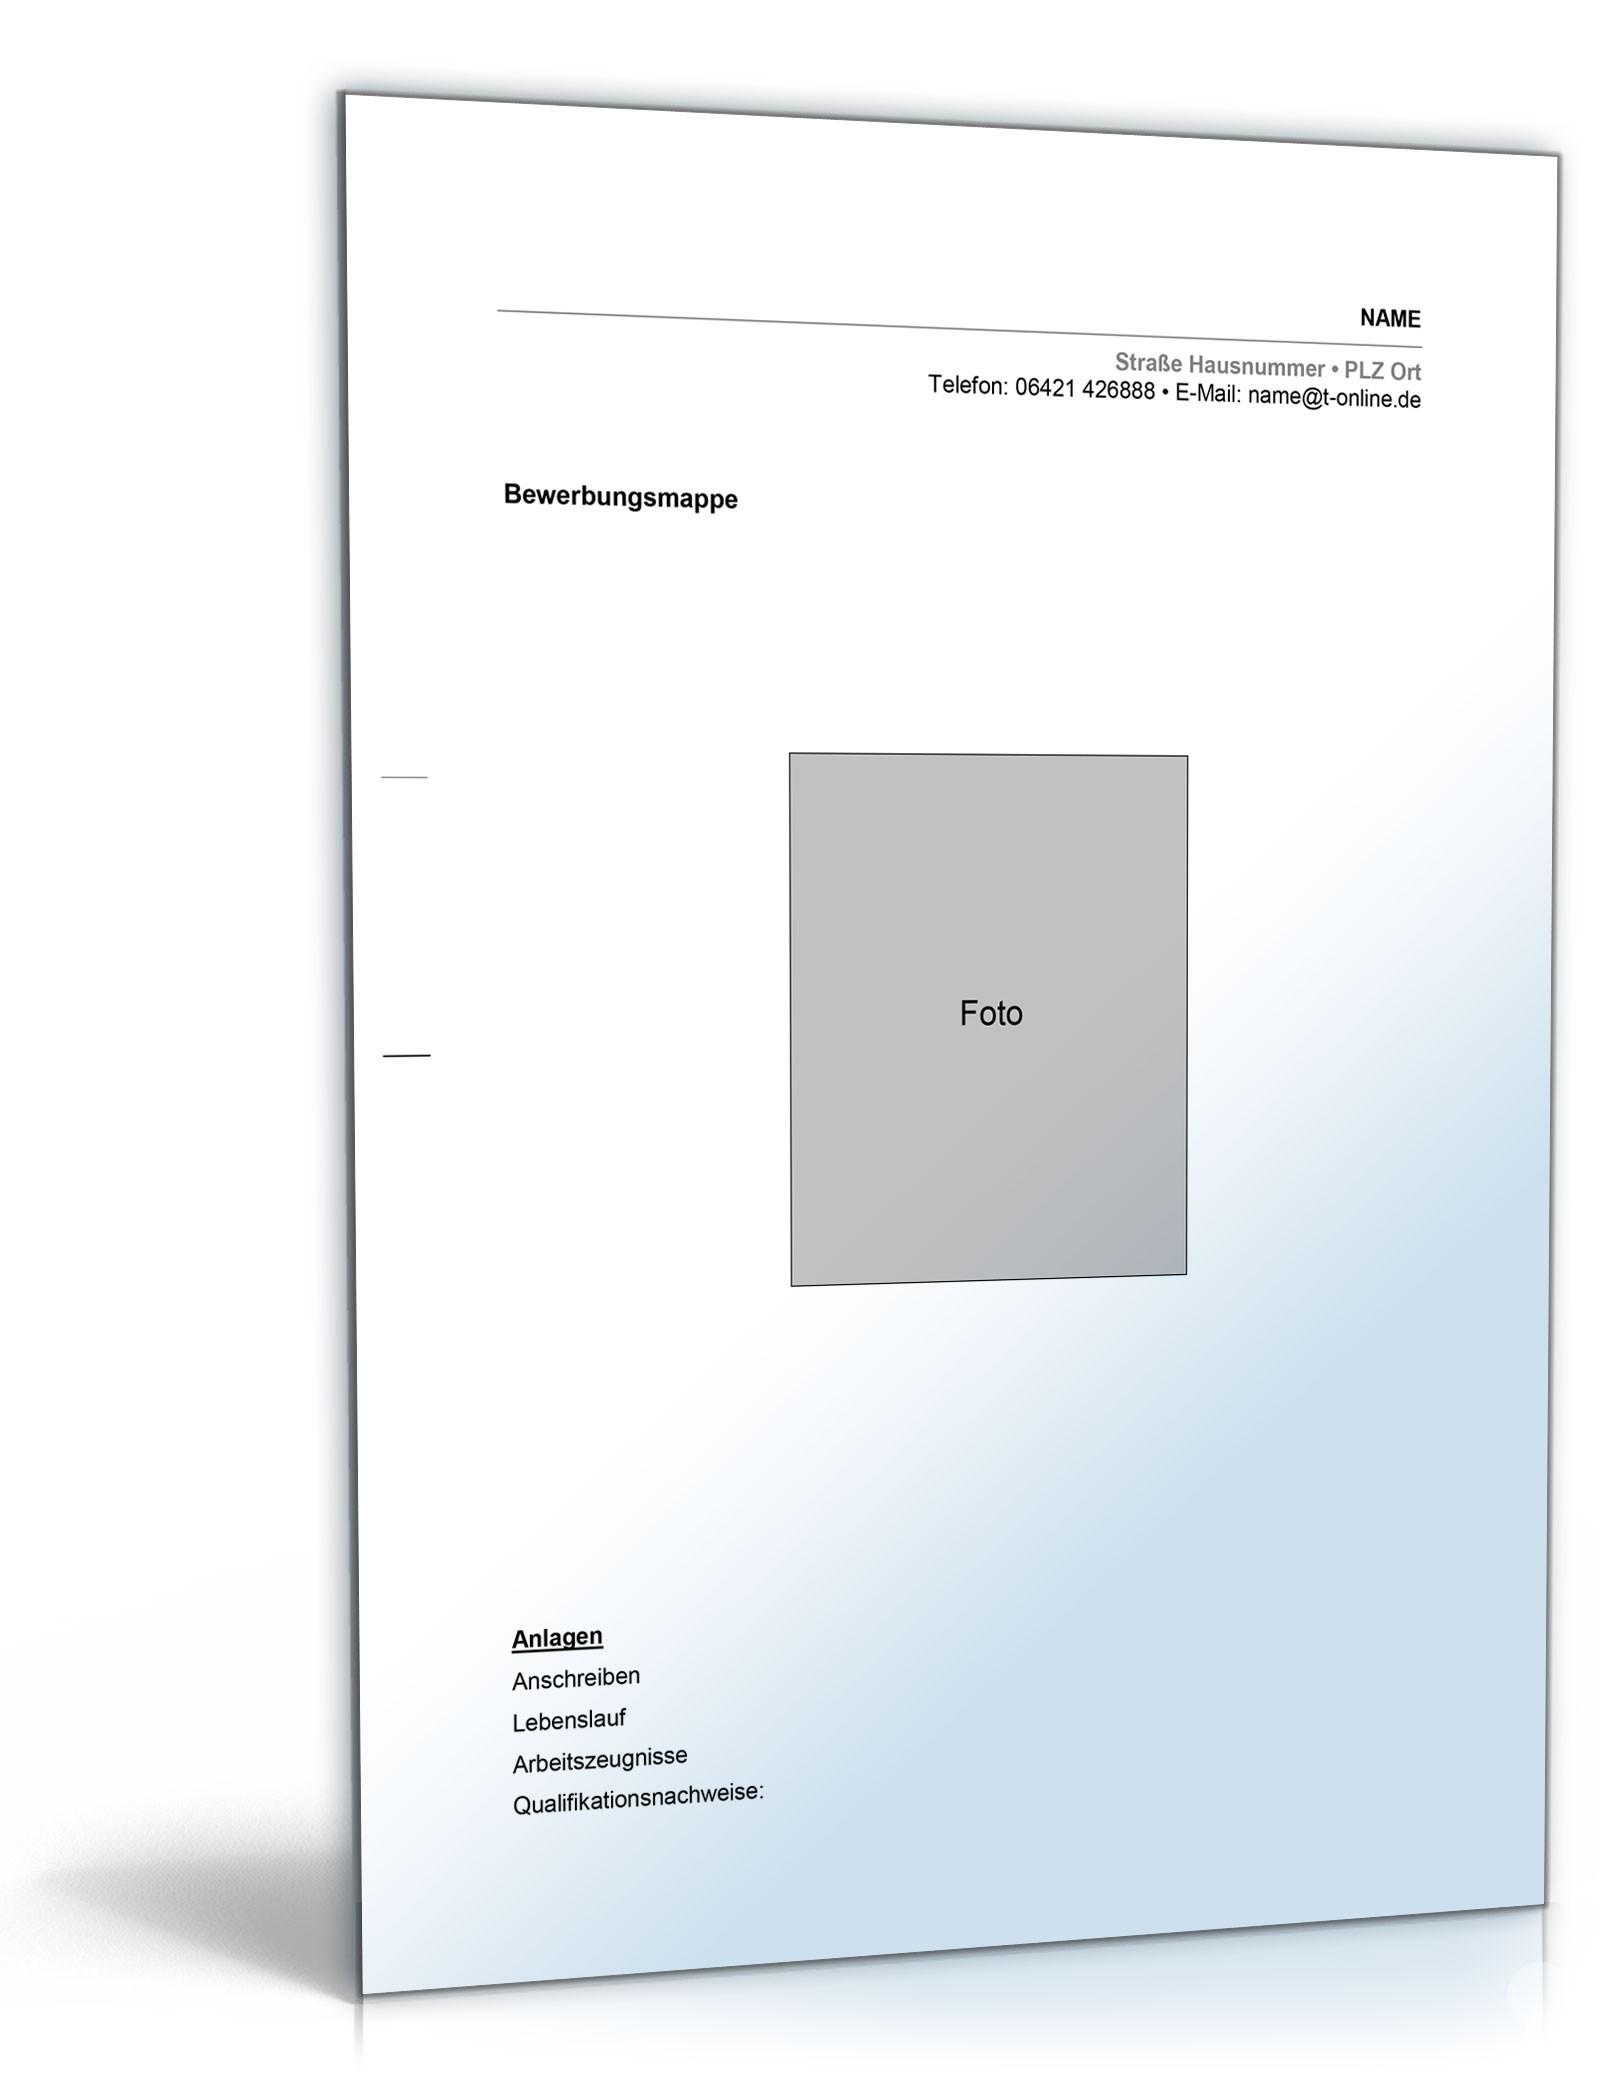 Bewerbungs-Paket Bundeswehr-Absolventen | Muster zum Download